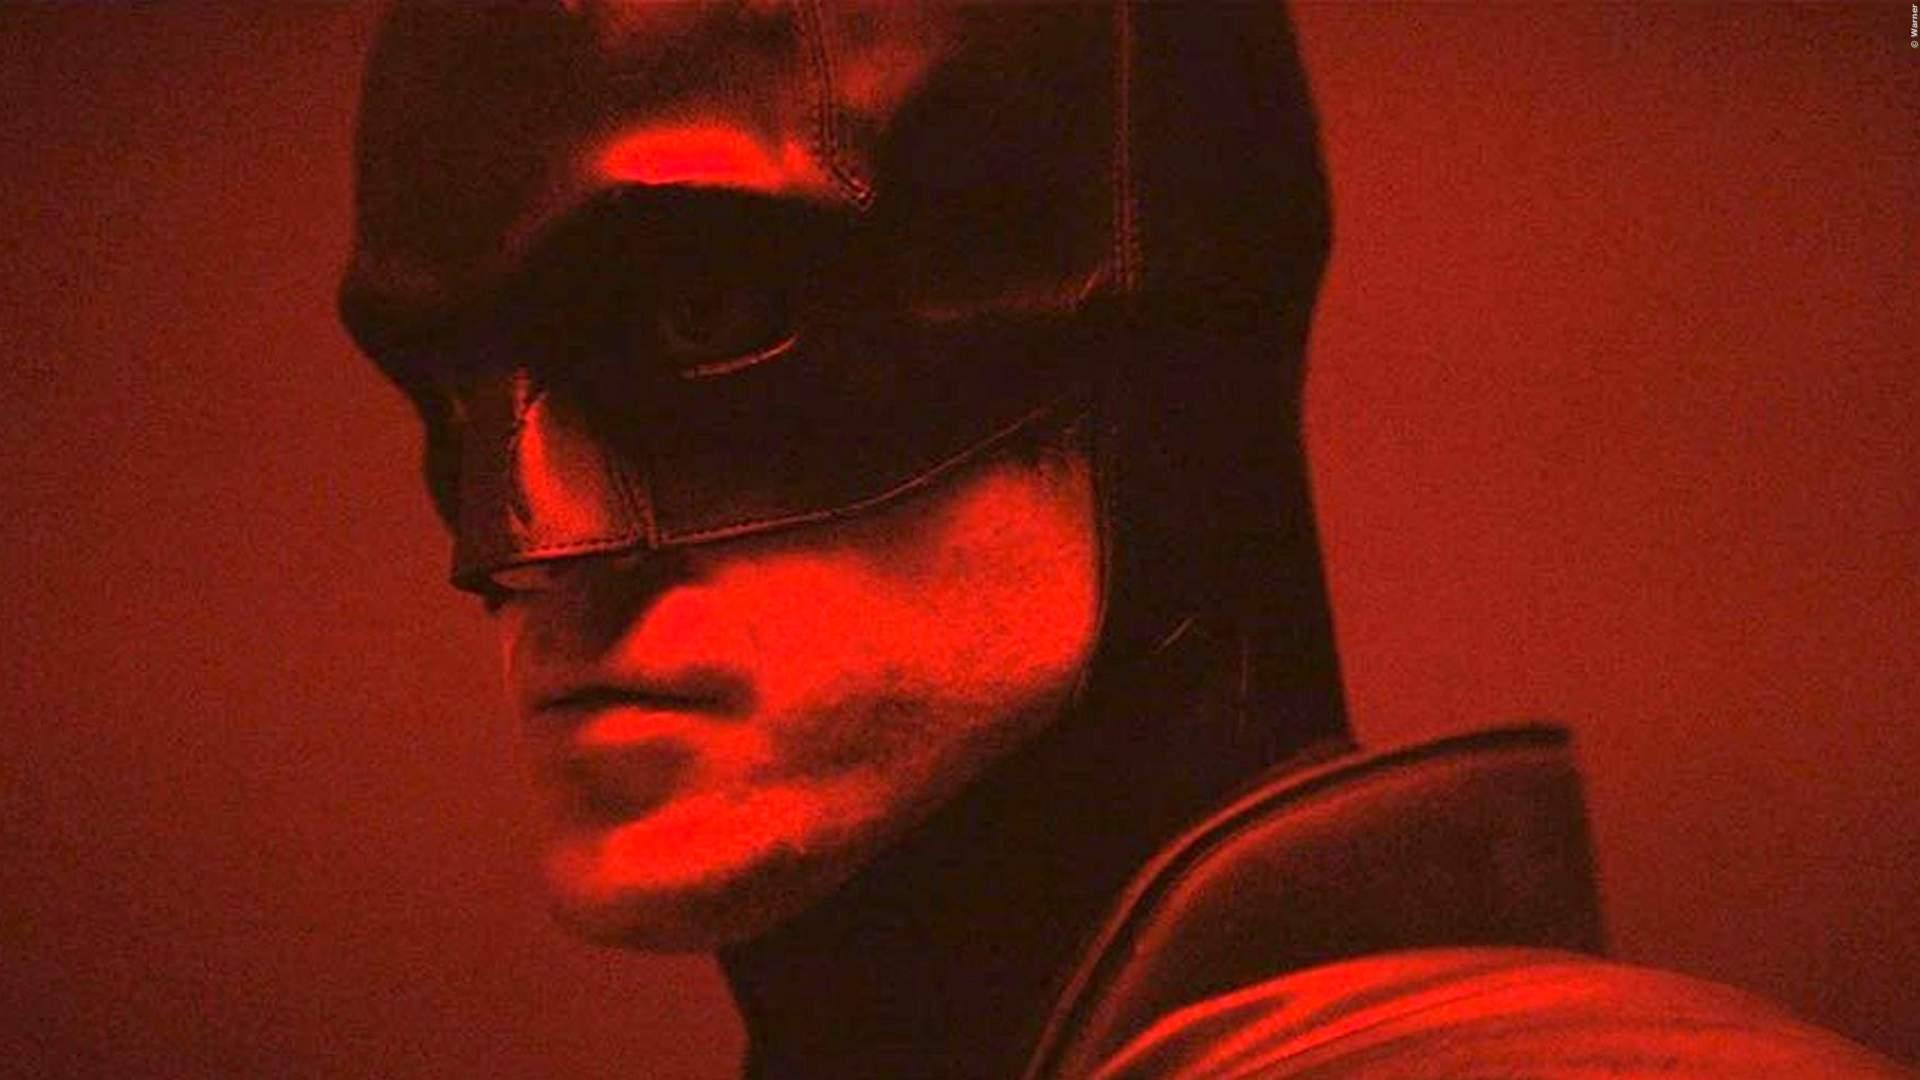 ENTDECKT: Neues Bat-Symbol freut Fans ganz besonders.